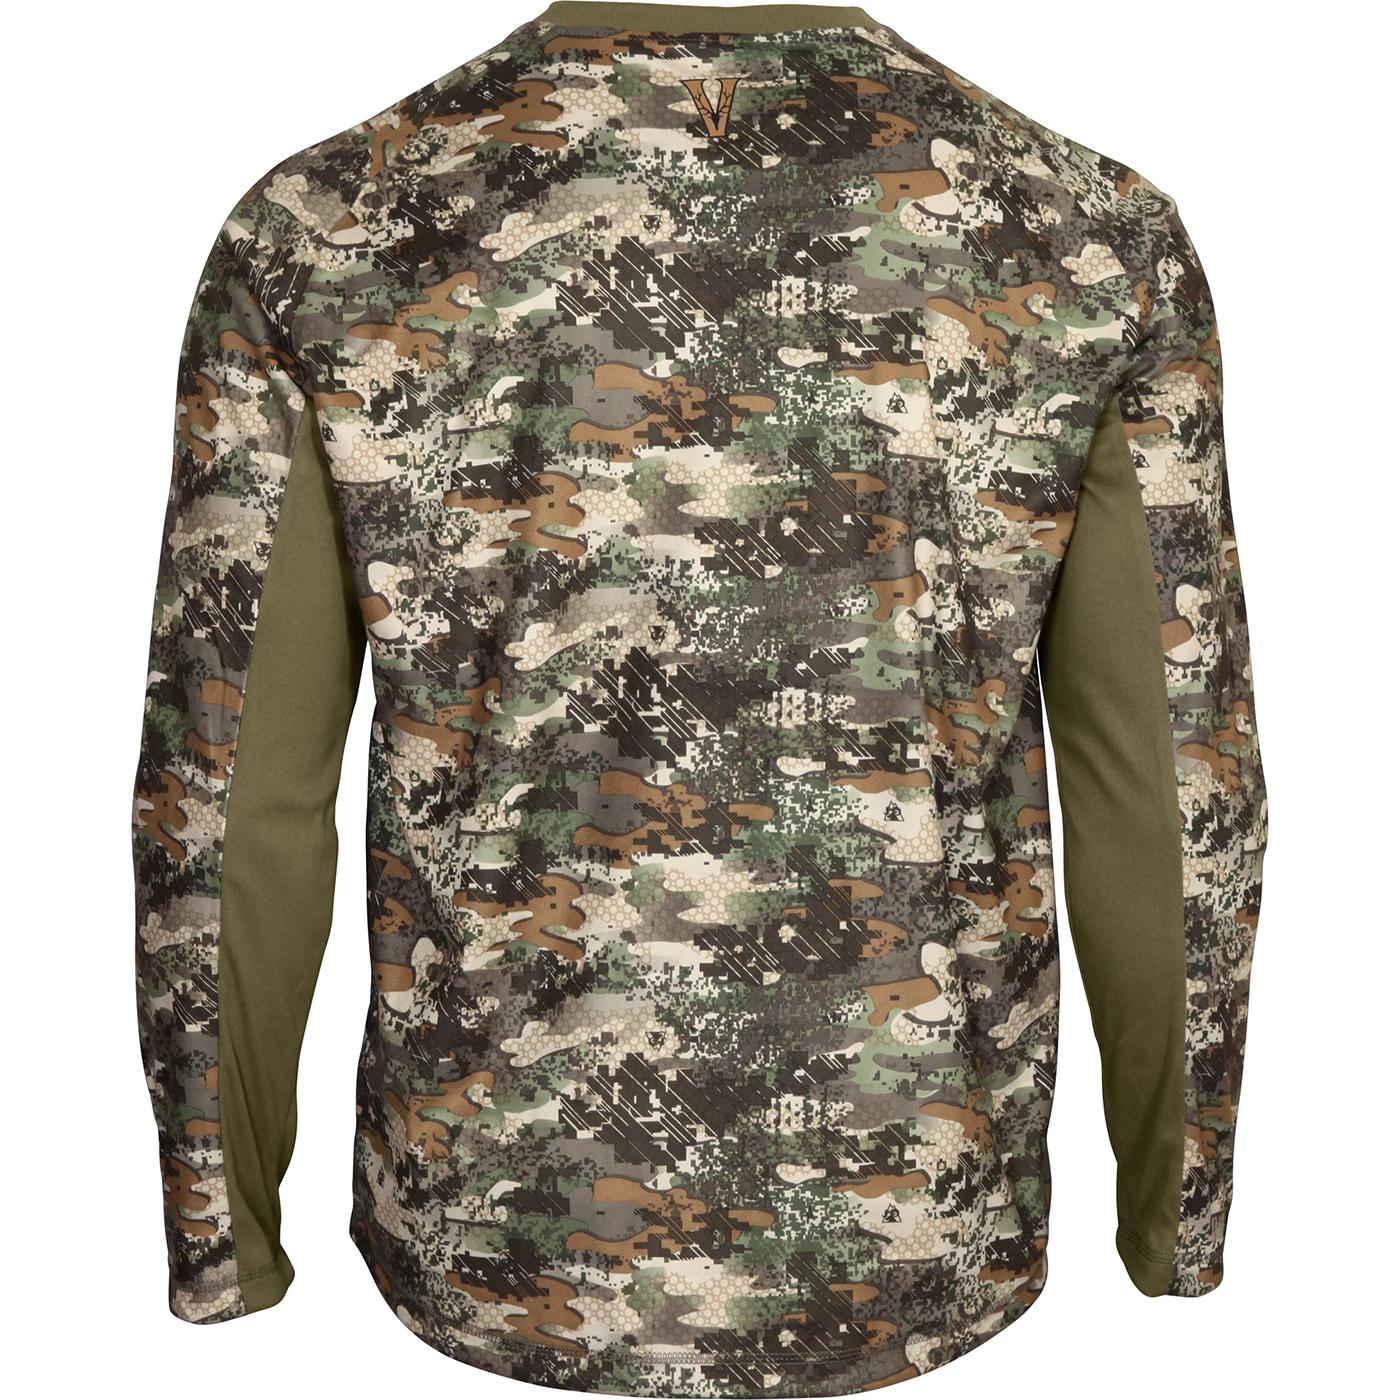 2781b02b70efd Rocky SilentHunter Scent Control Long-Sleeve Shirt, #HW00198